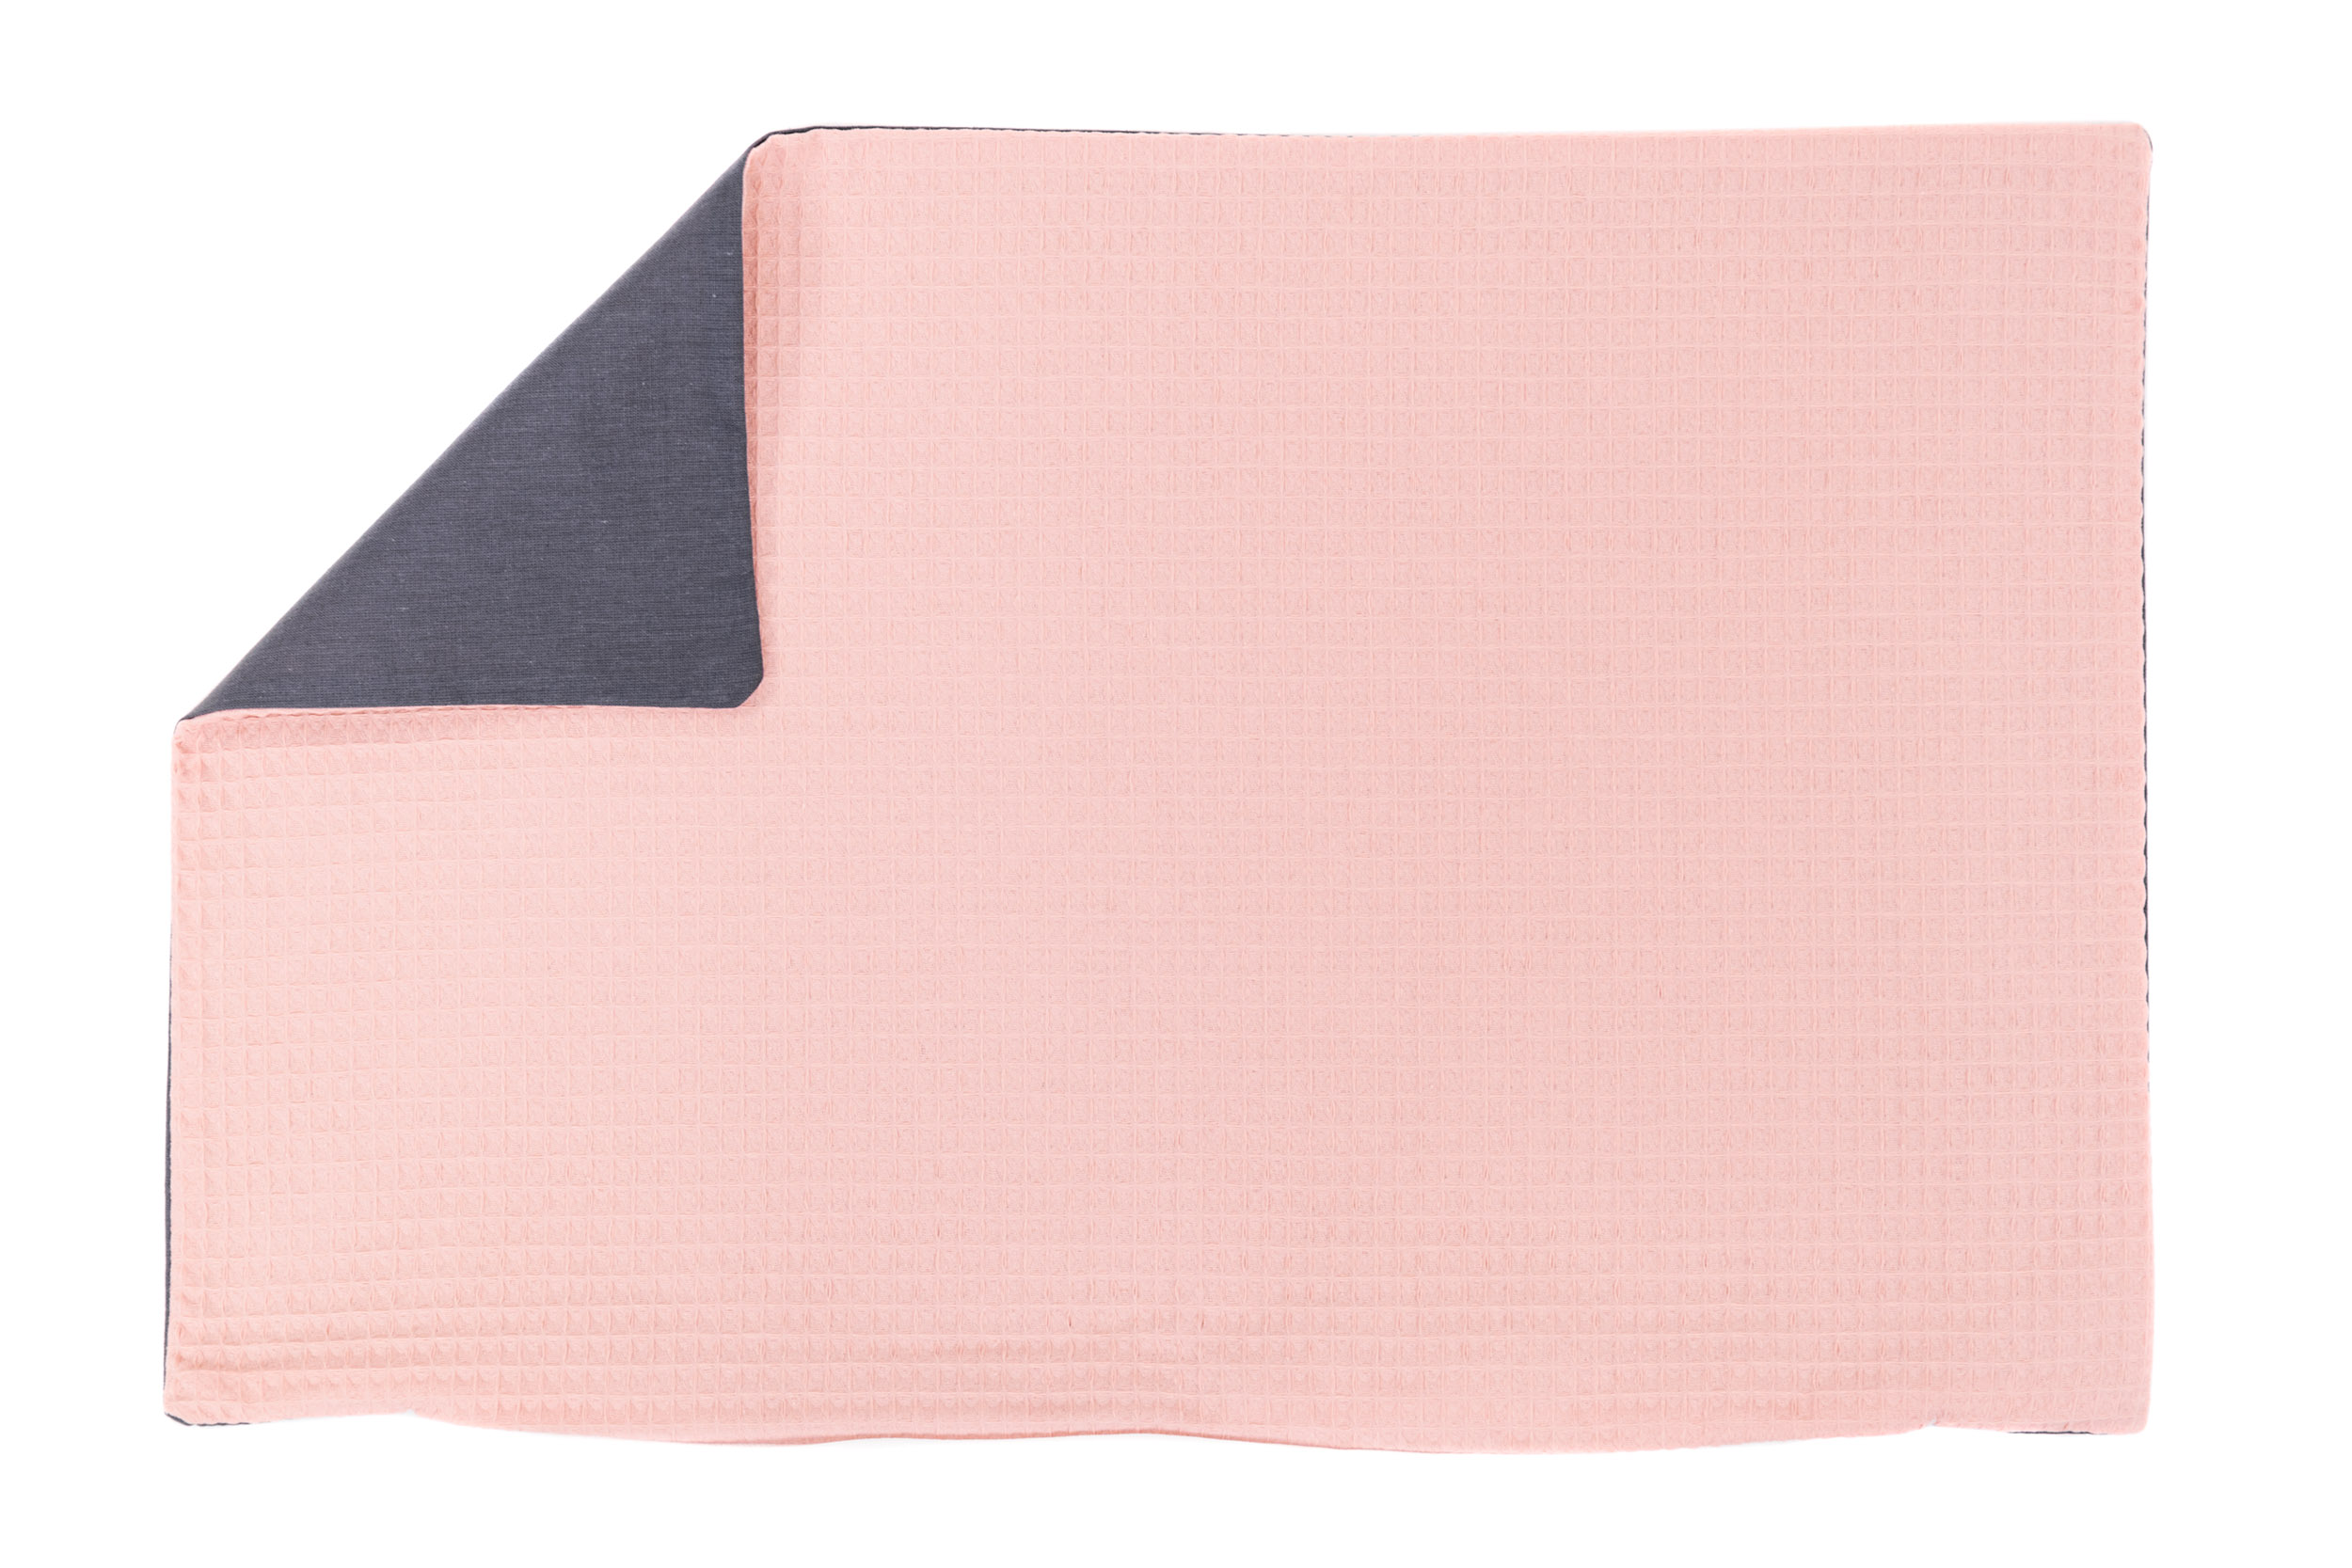 Kissenhülle Zierkissenbezug Kissenbezug ca. 60x40 cm für Kissen oder Dekokissen Rosa Anthrazit